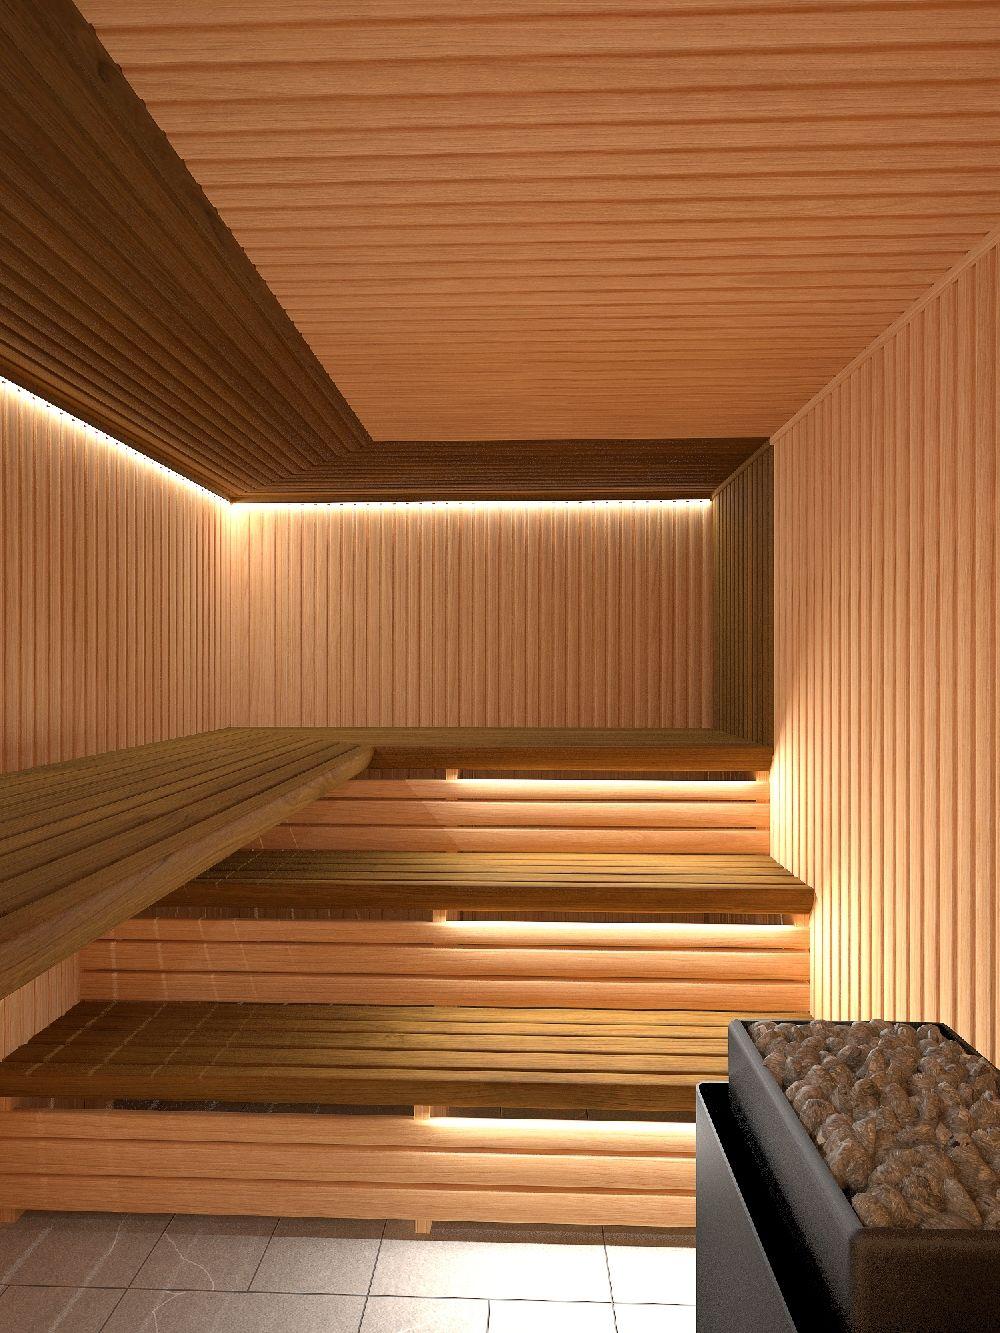 Sauna project by Artom Bugo at Coroflot.com